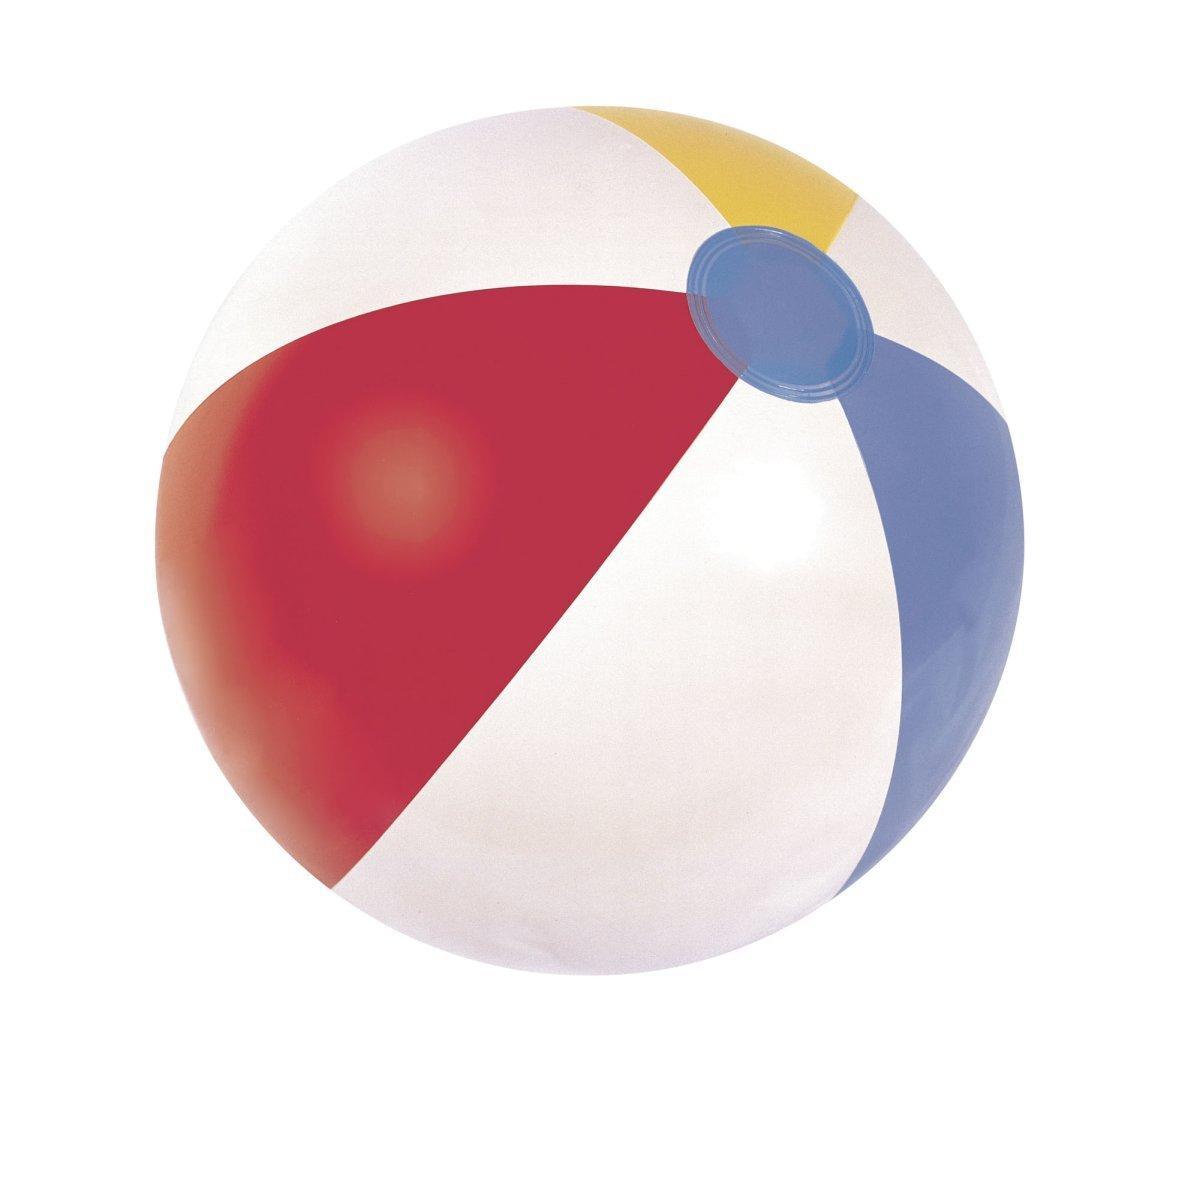 Надувной мяч Intex 59020 (Bestway 31022), 51 cм